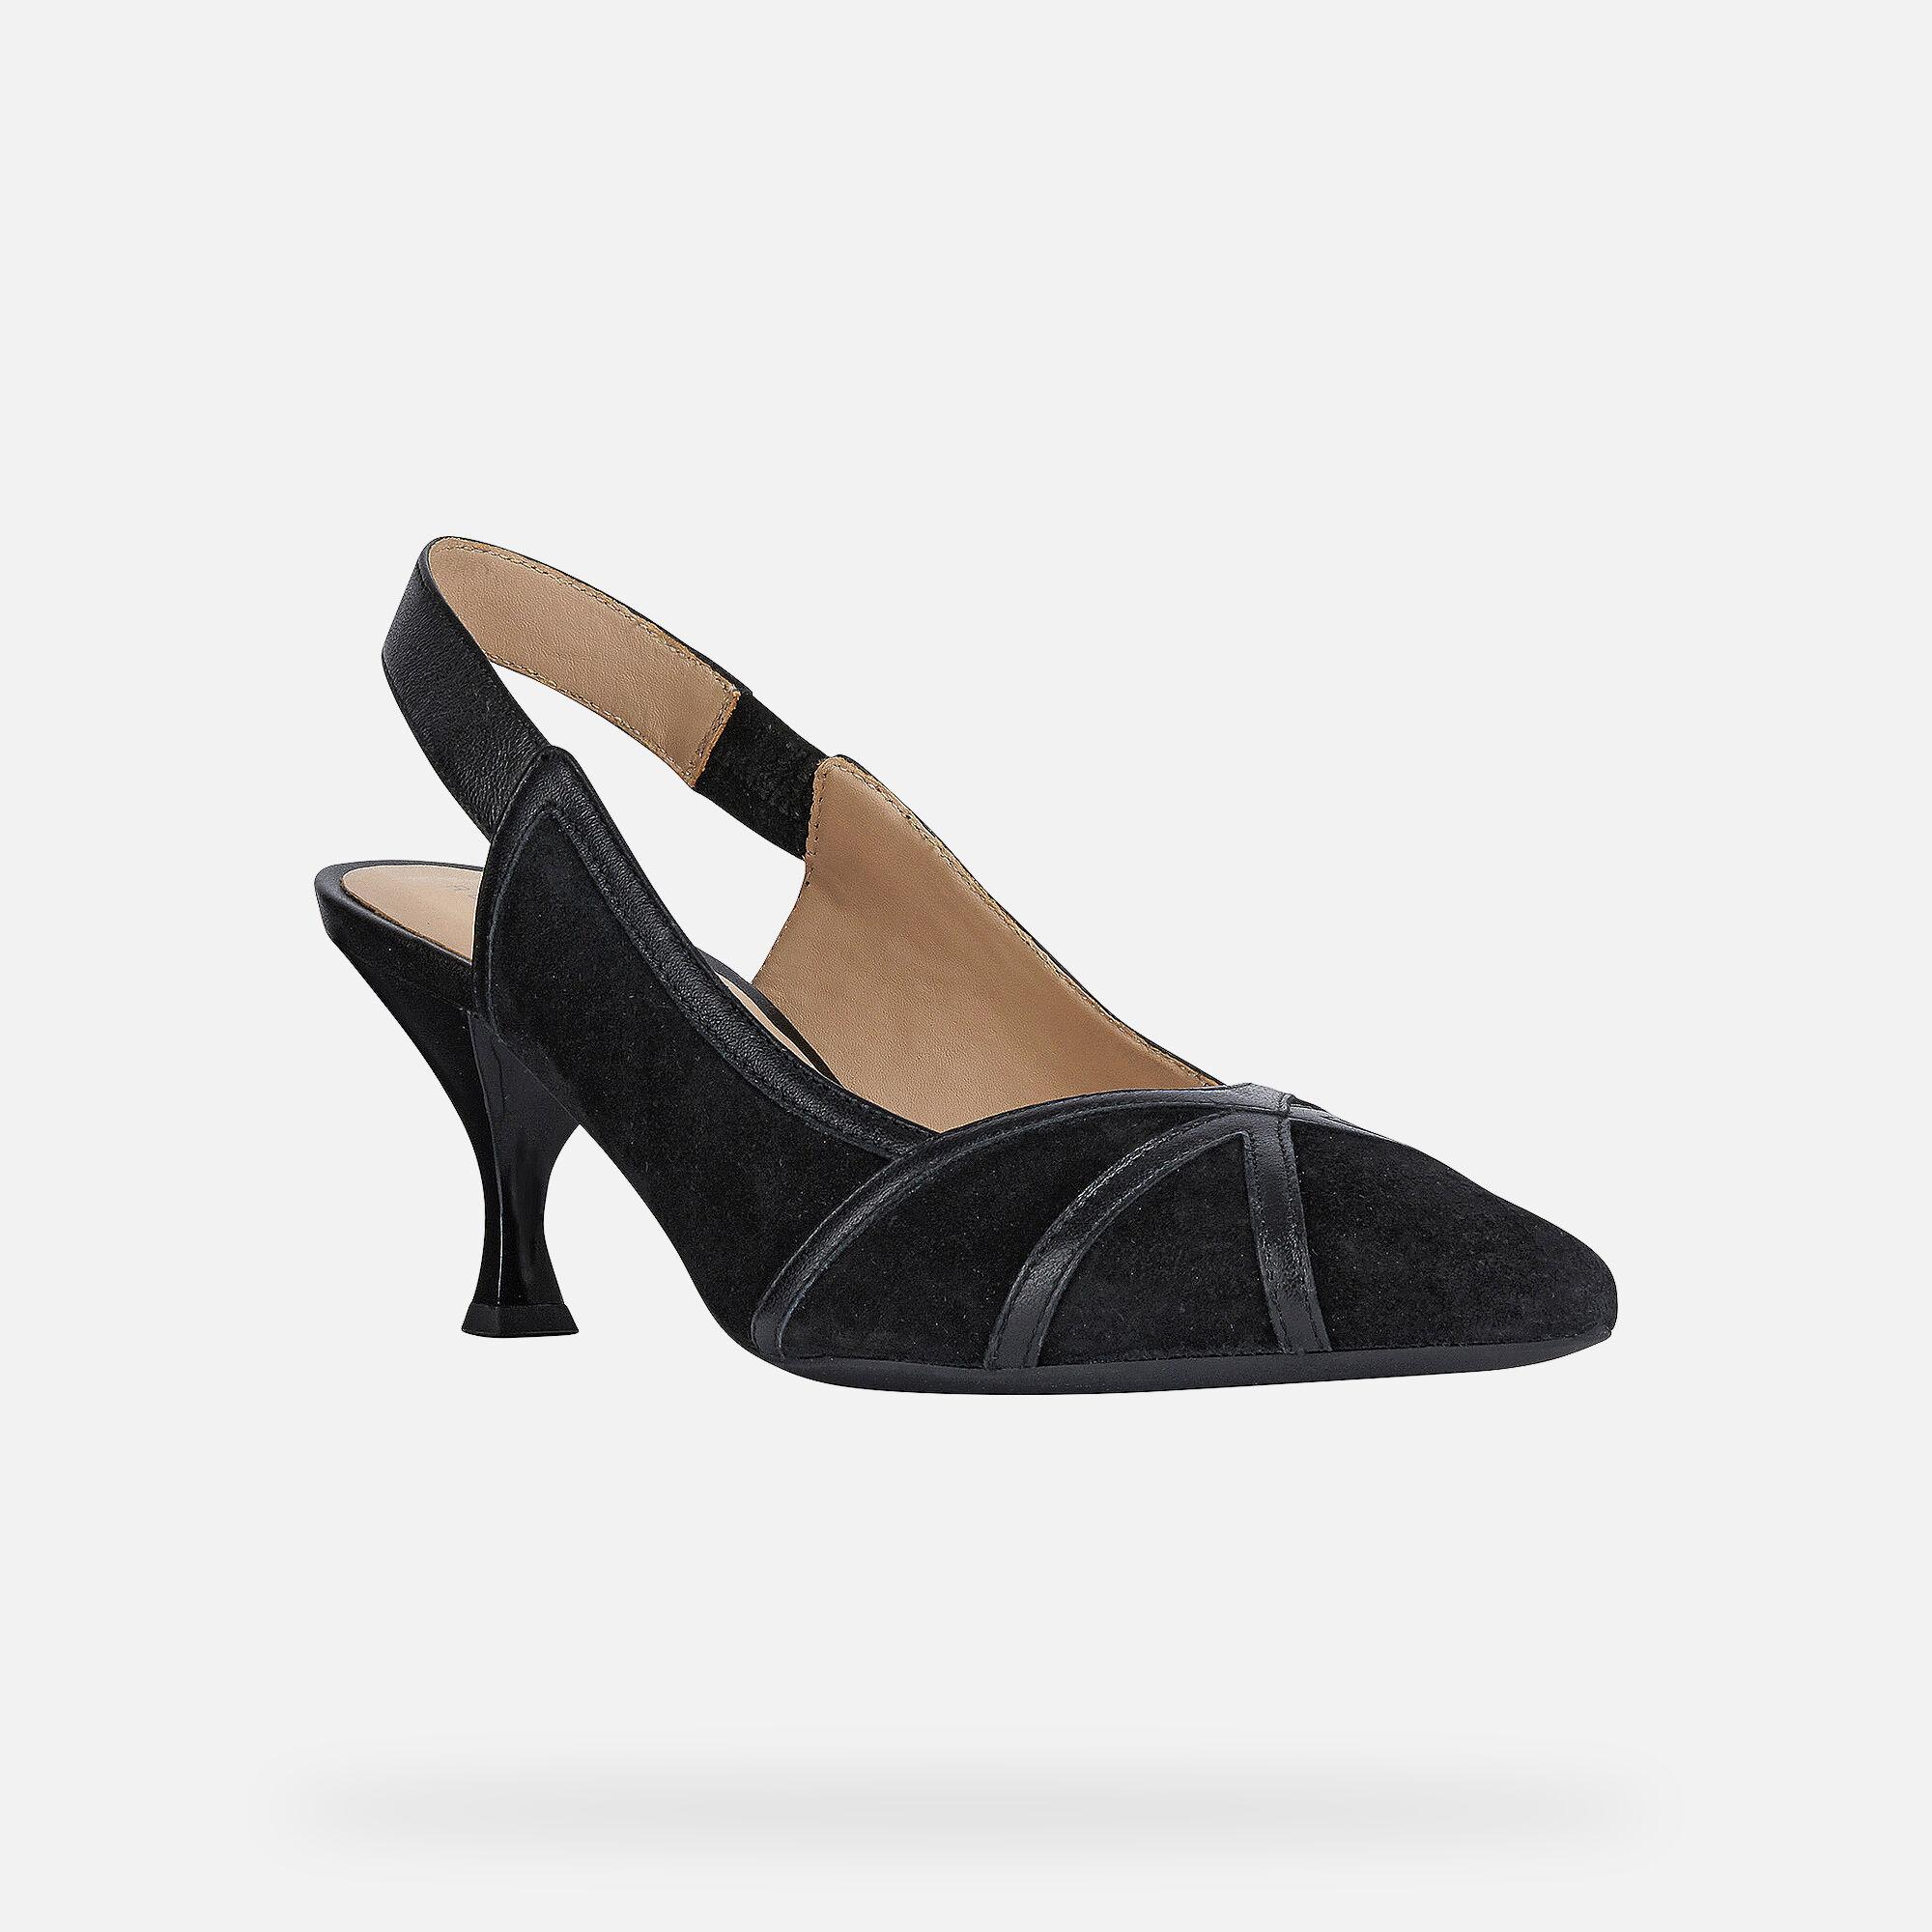 Geox ELISANGEL Woman: Black Shoes